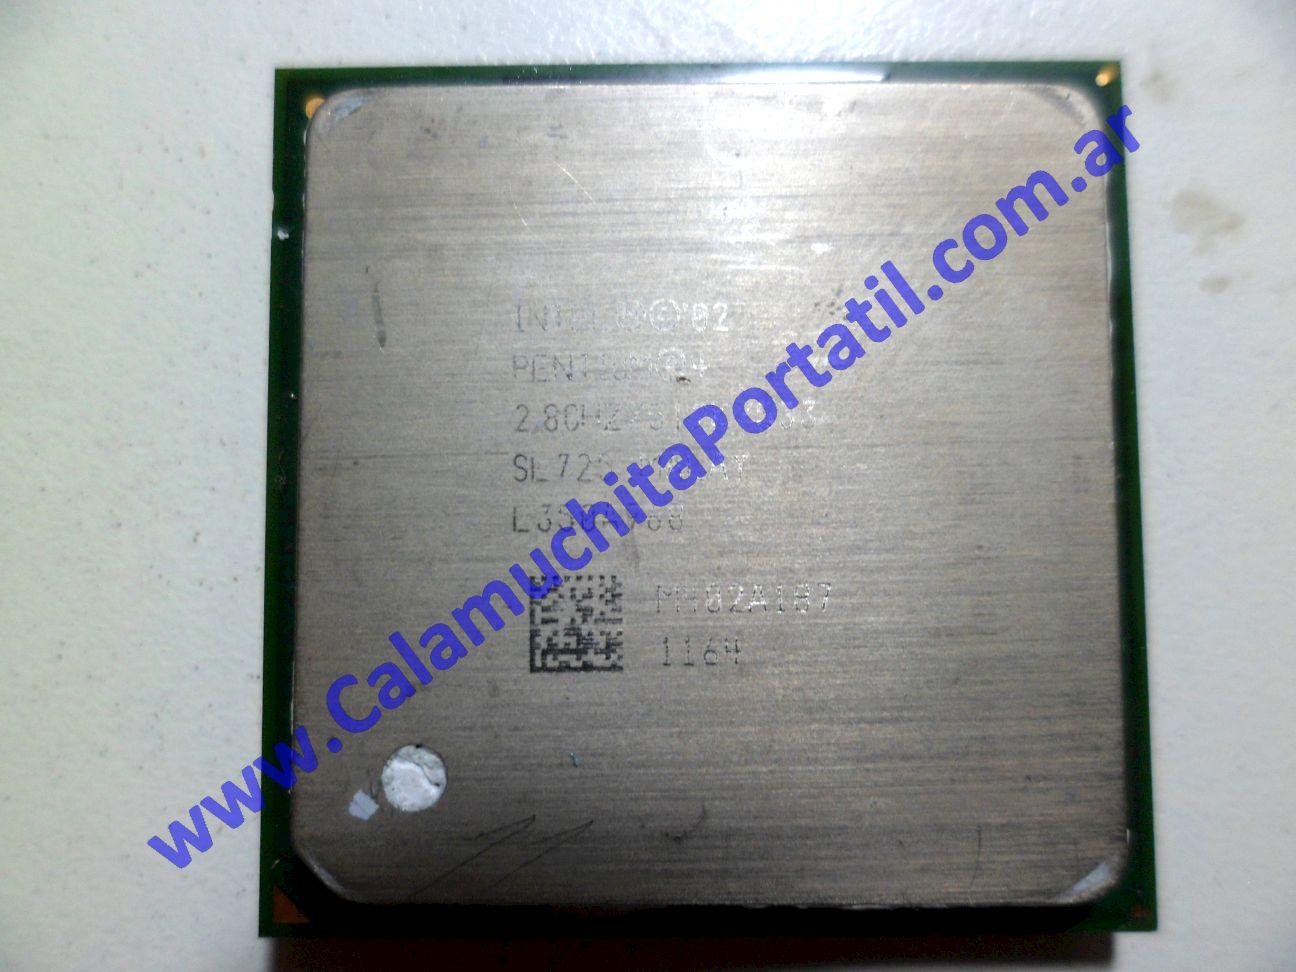 0025QQA Procesador Dell Inspiron 5150